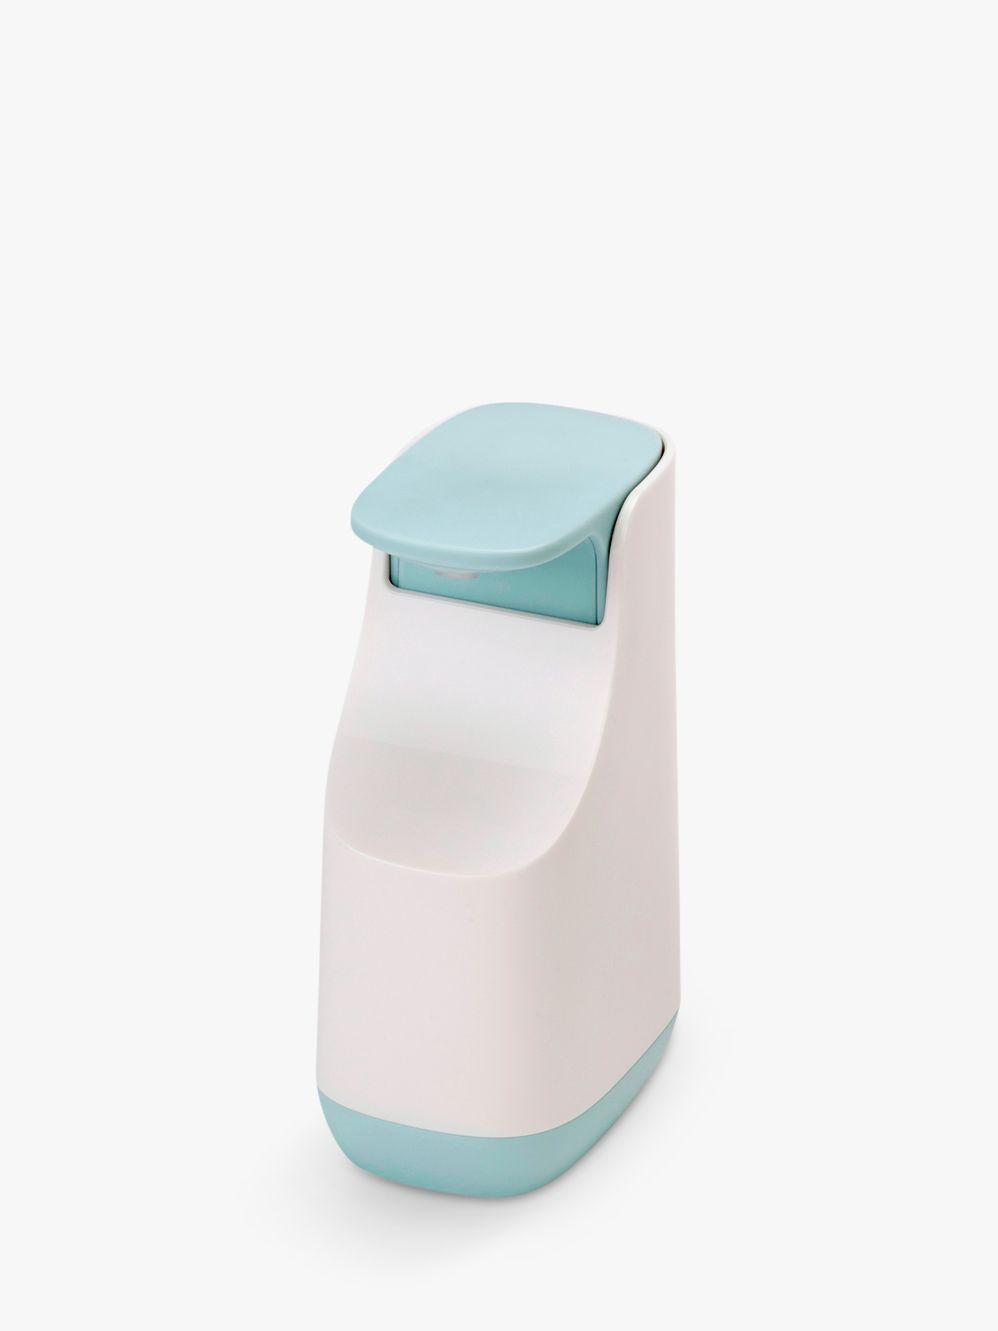 Joseph Joseph Joseph Joseph Slim™ Compact Soap Dispenser